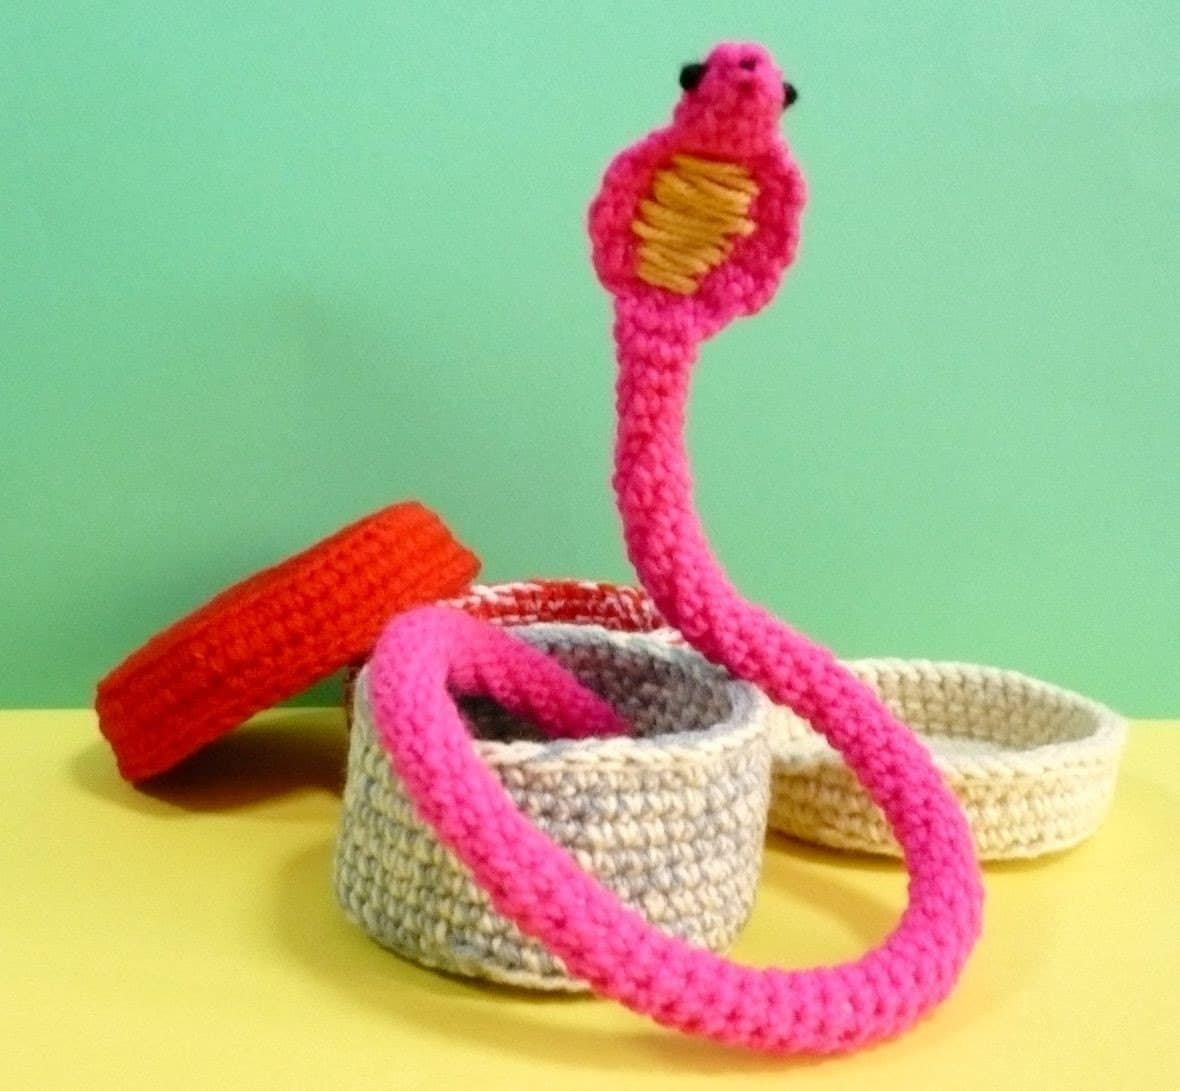 Crochet Amigurumi Dolphin Pattern : CROCHET DOLPHIN PATTERNS Crochet Patterns